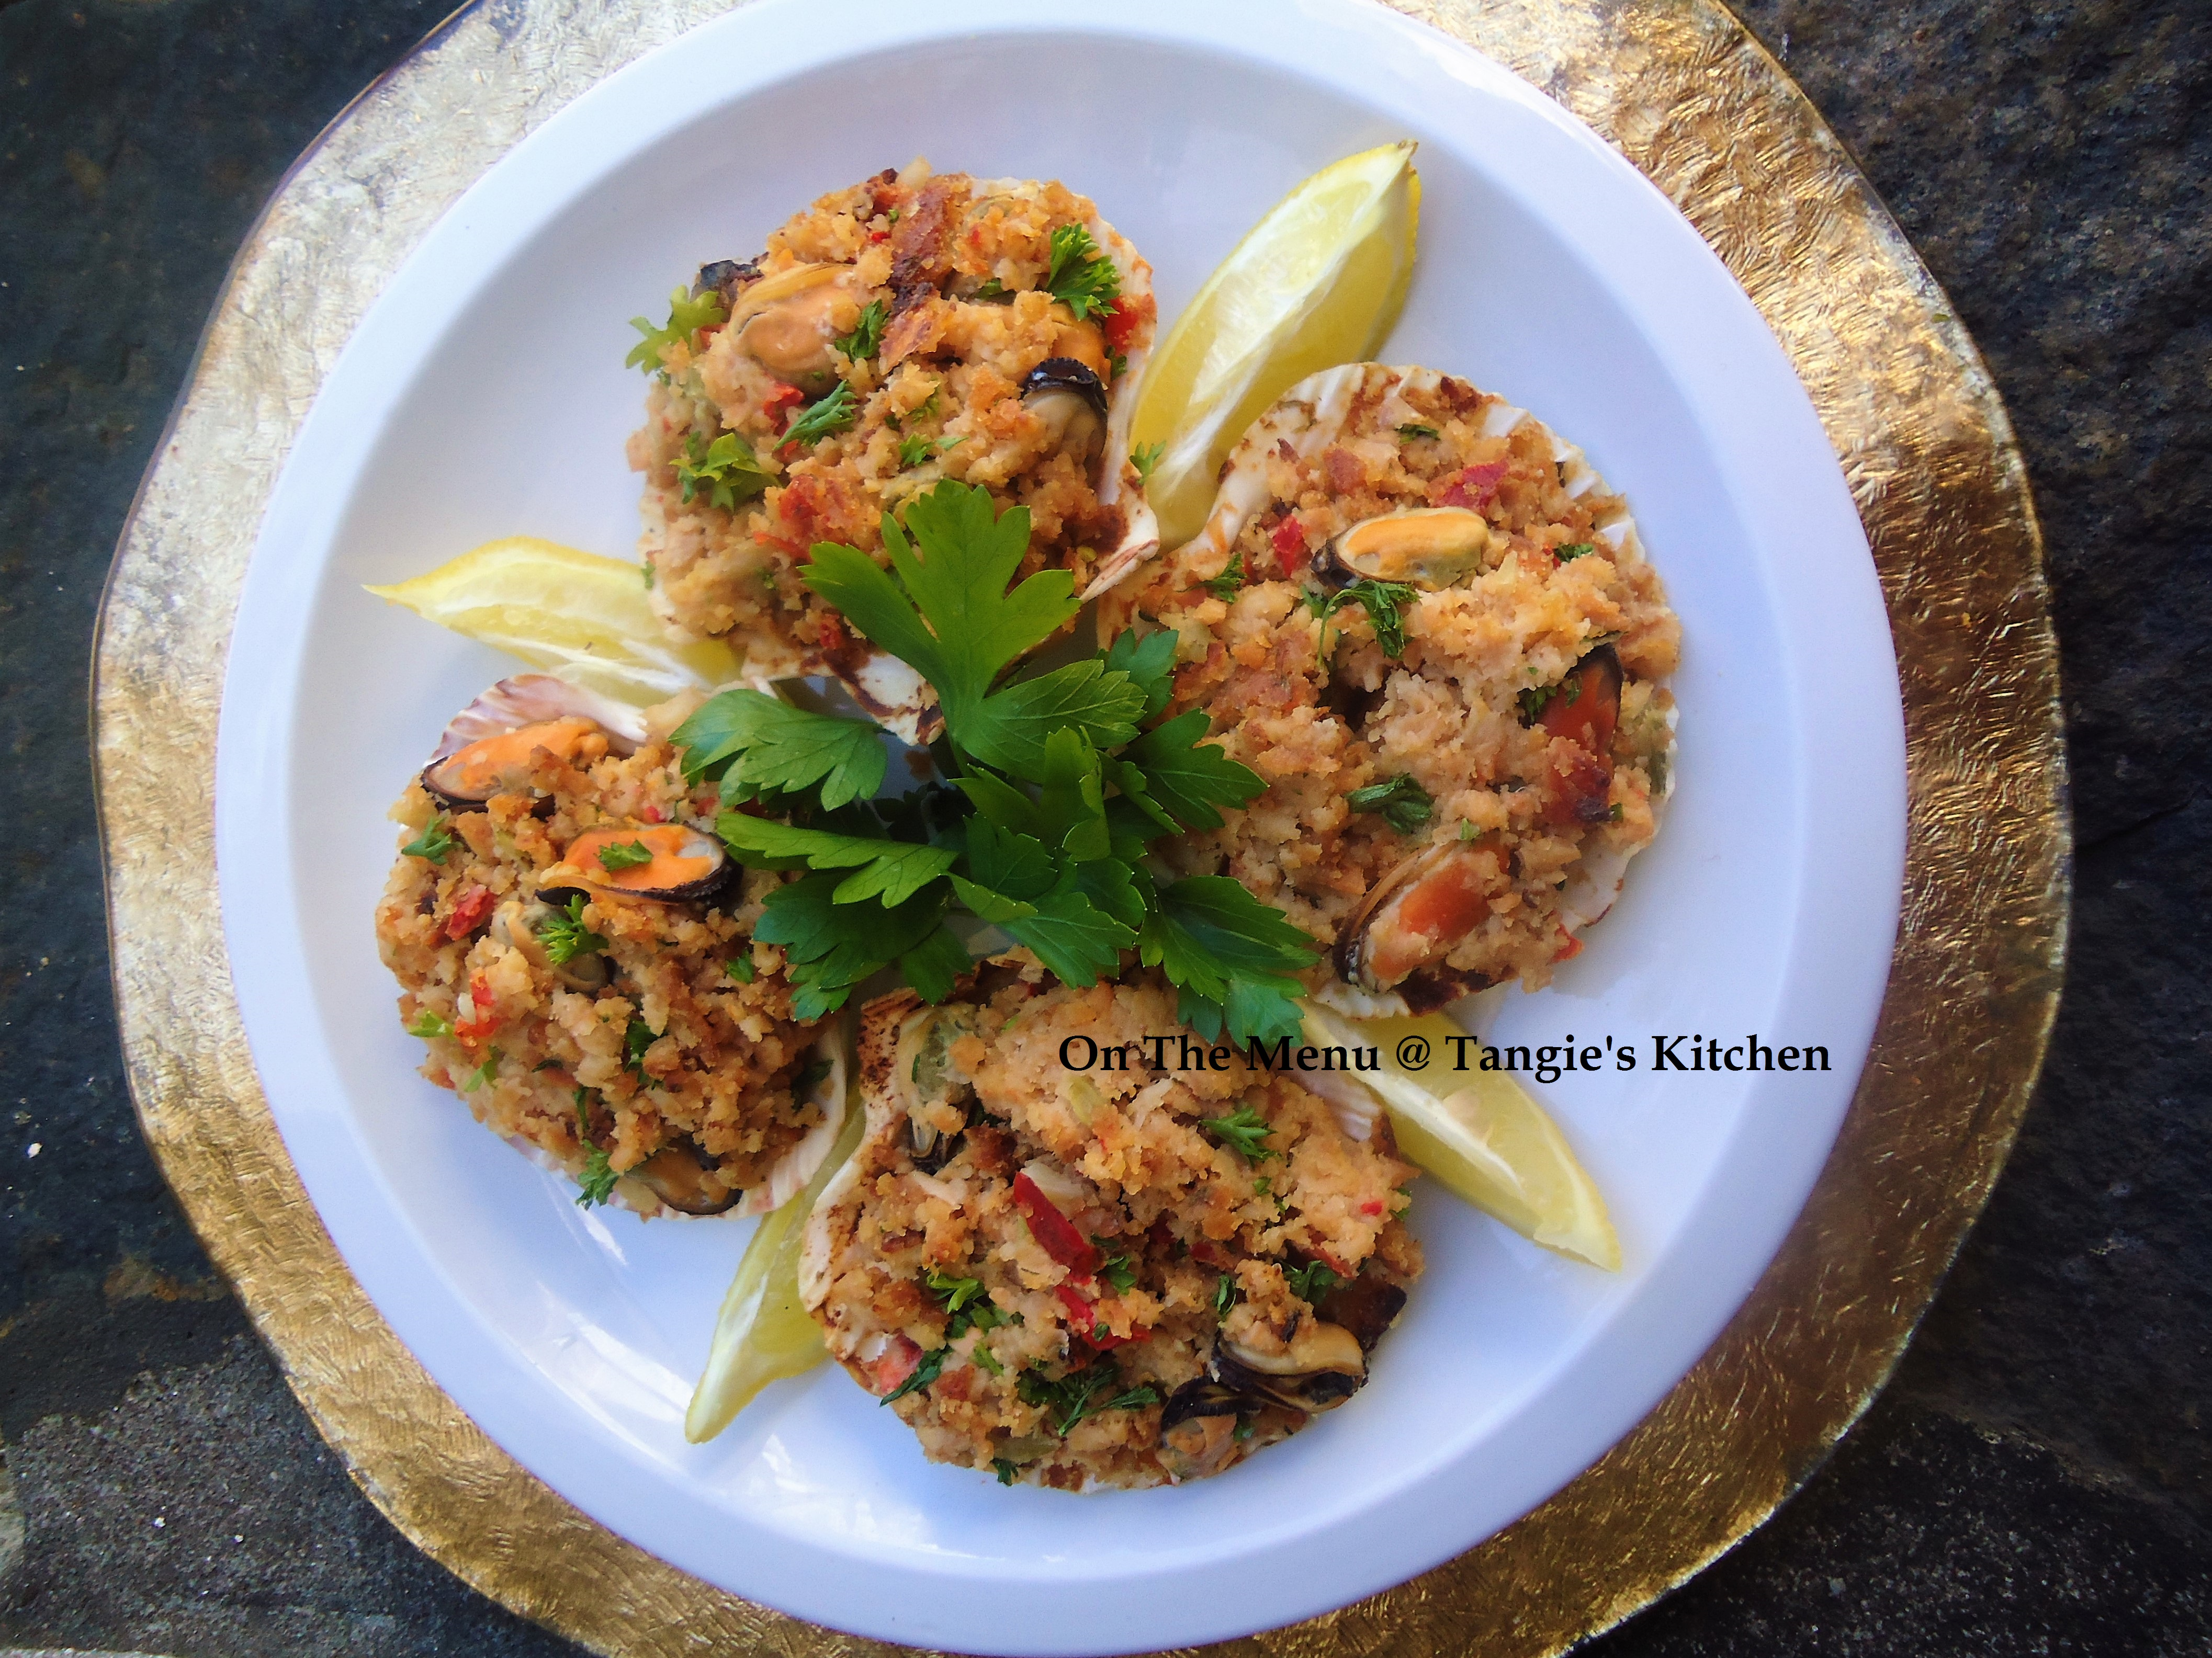 Coquilles De Fruits De Mer On The Menu Tangie S Kitchen